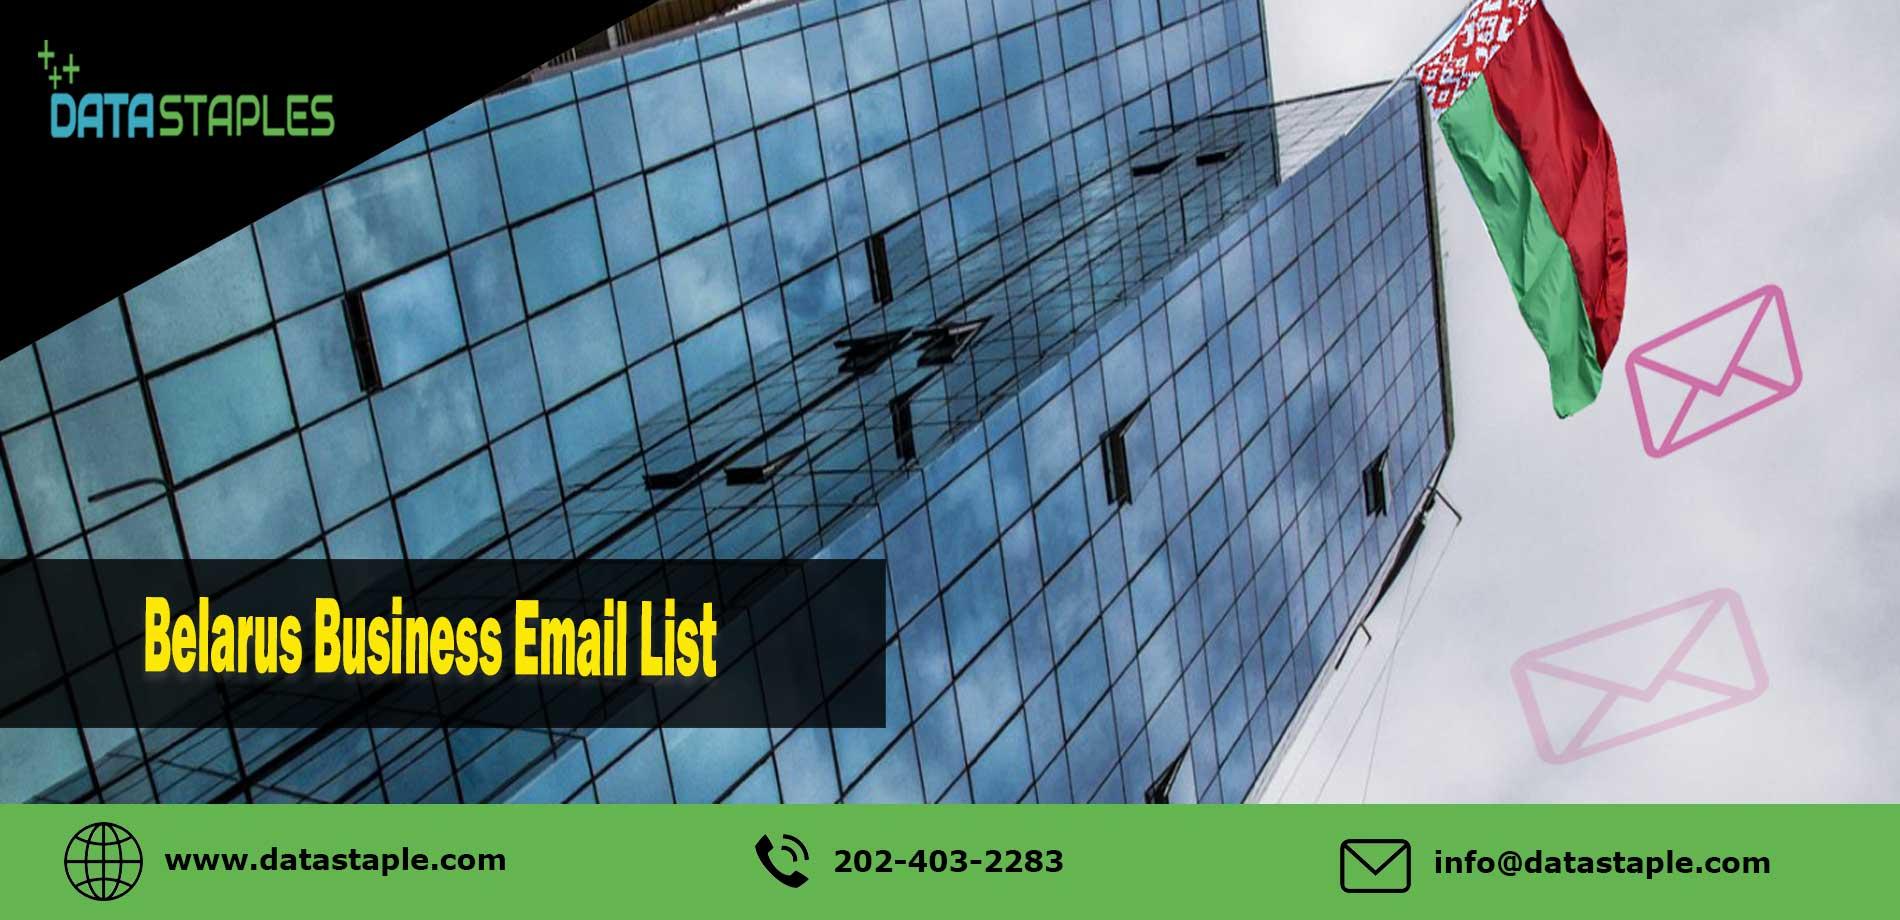 Belarus Business Email List   DataStaples